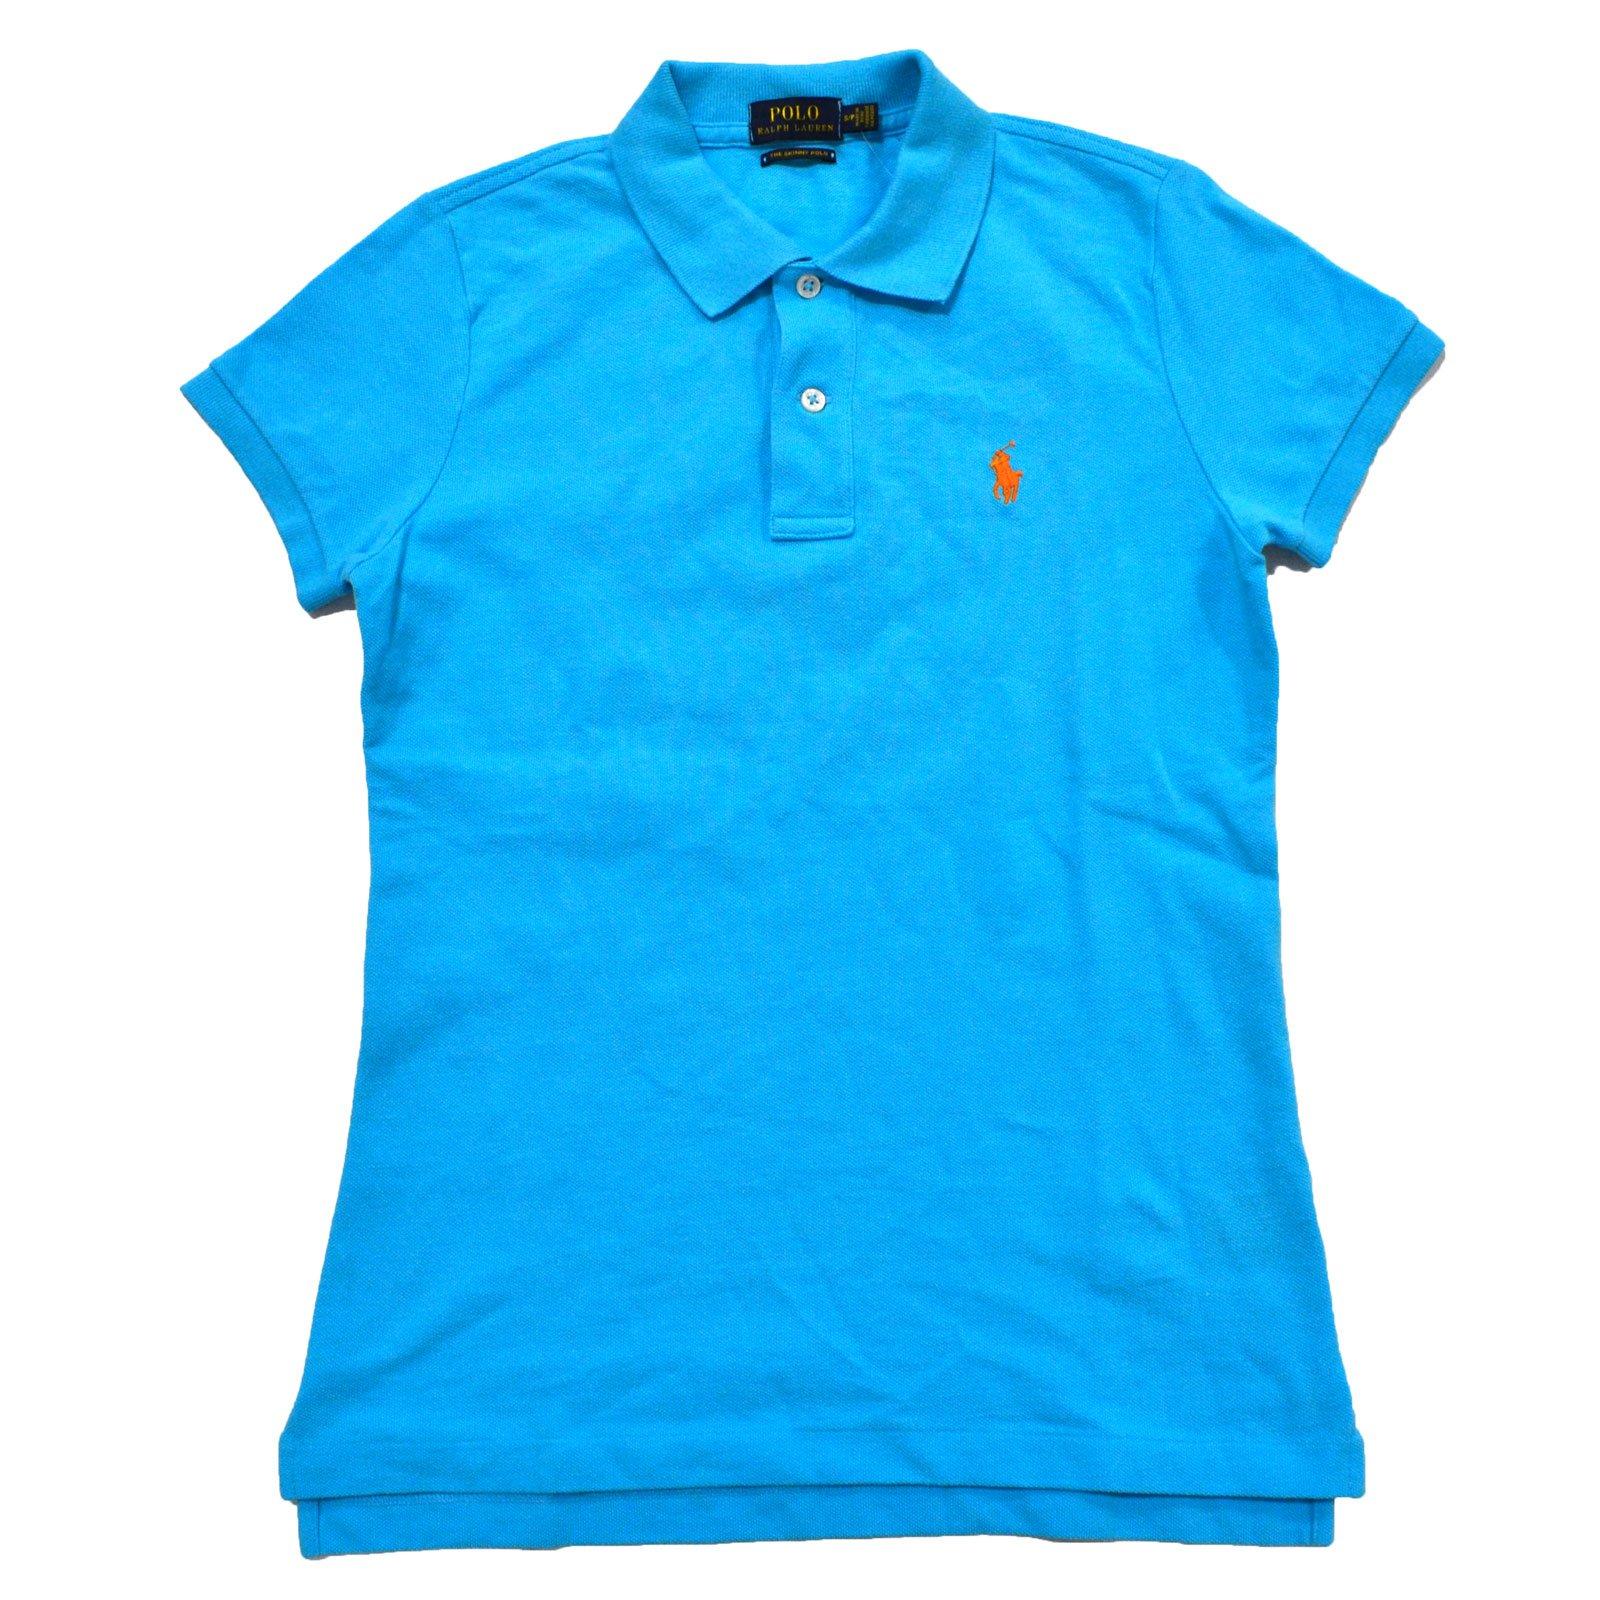 Ralph Lauren Womens Skinny Fit Mesh Polo Shirt (M, Blue)